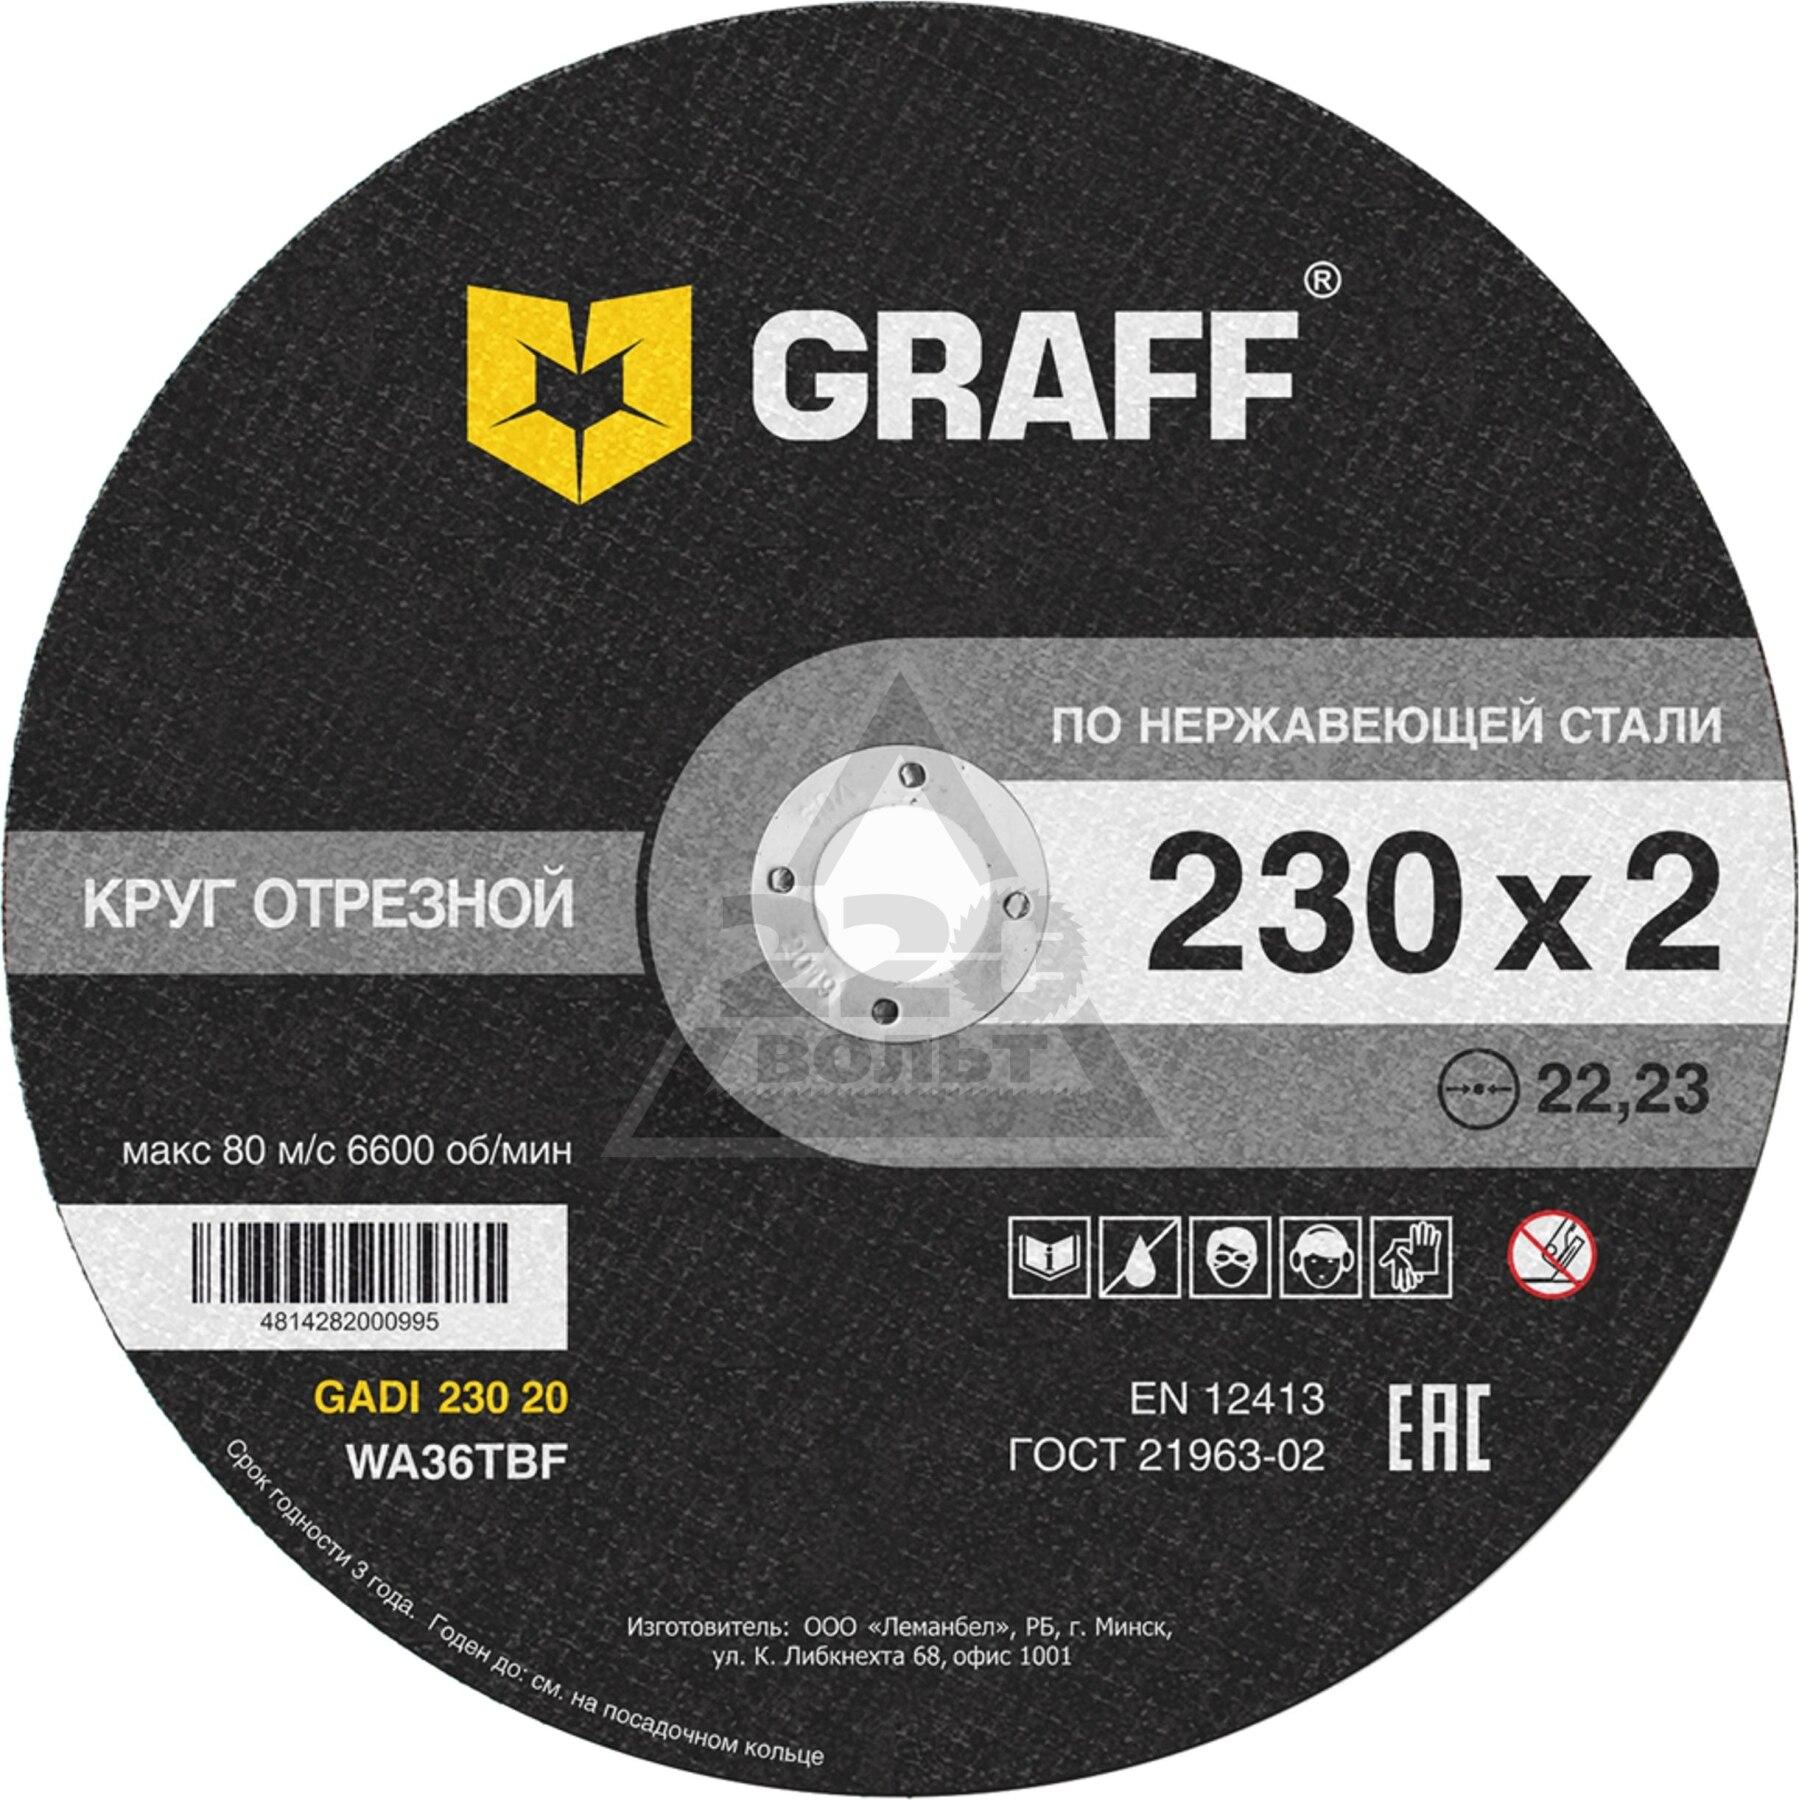 Circle Cutting GRAFF GADI 230 20